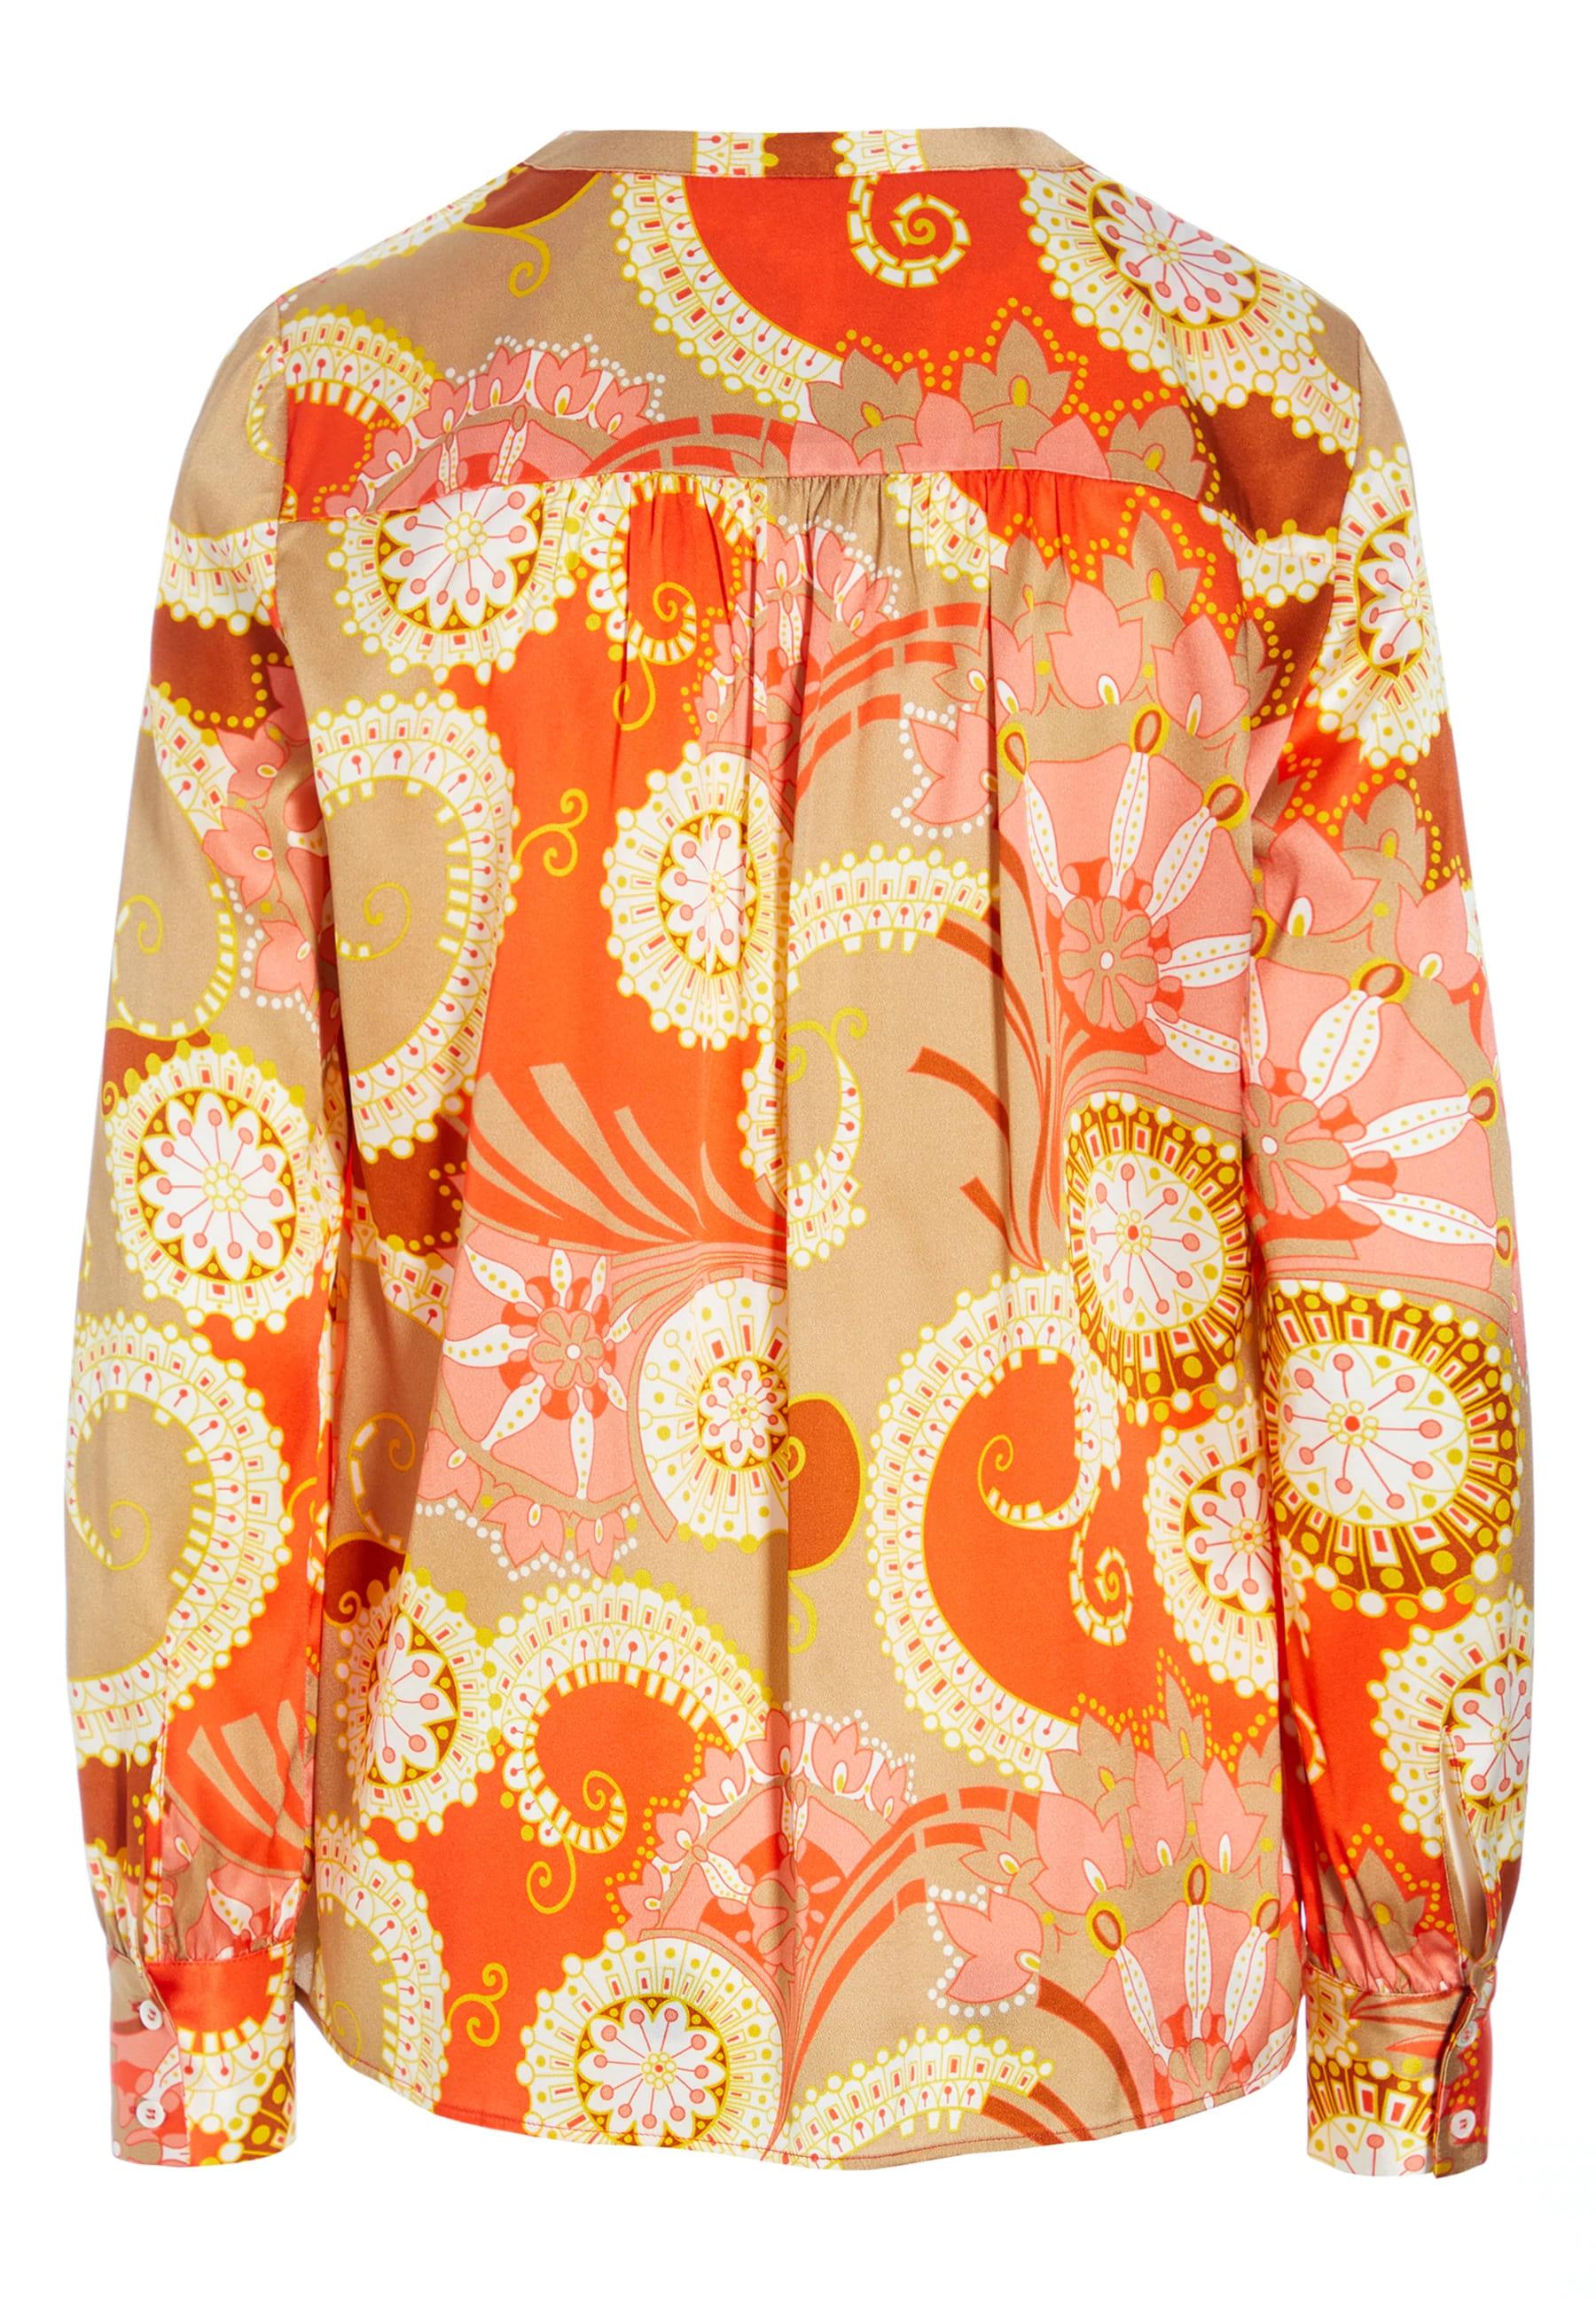 Seidenbluse Kay Paisley Orange